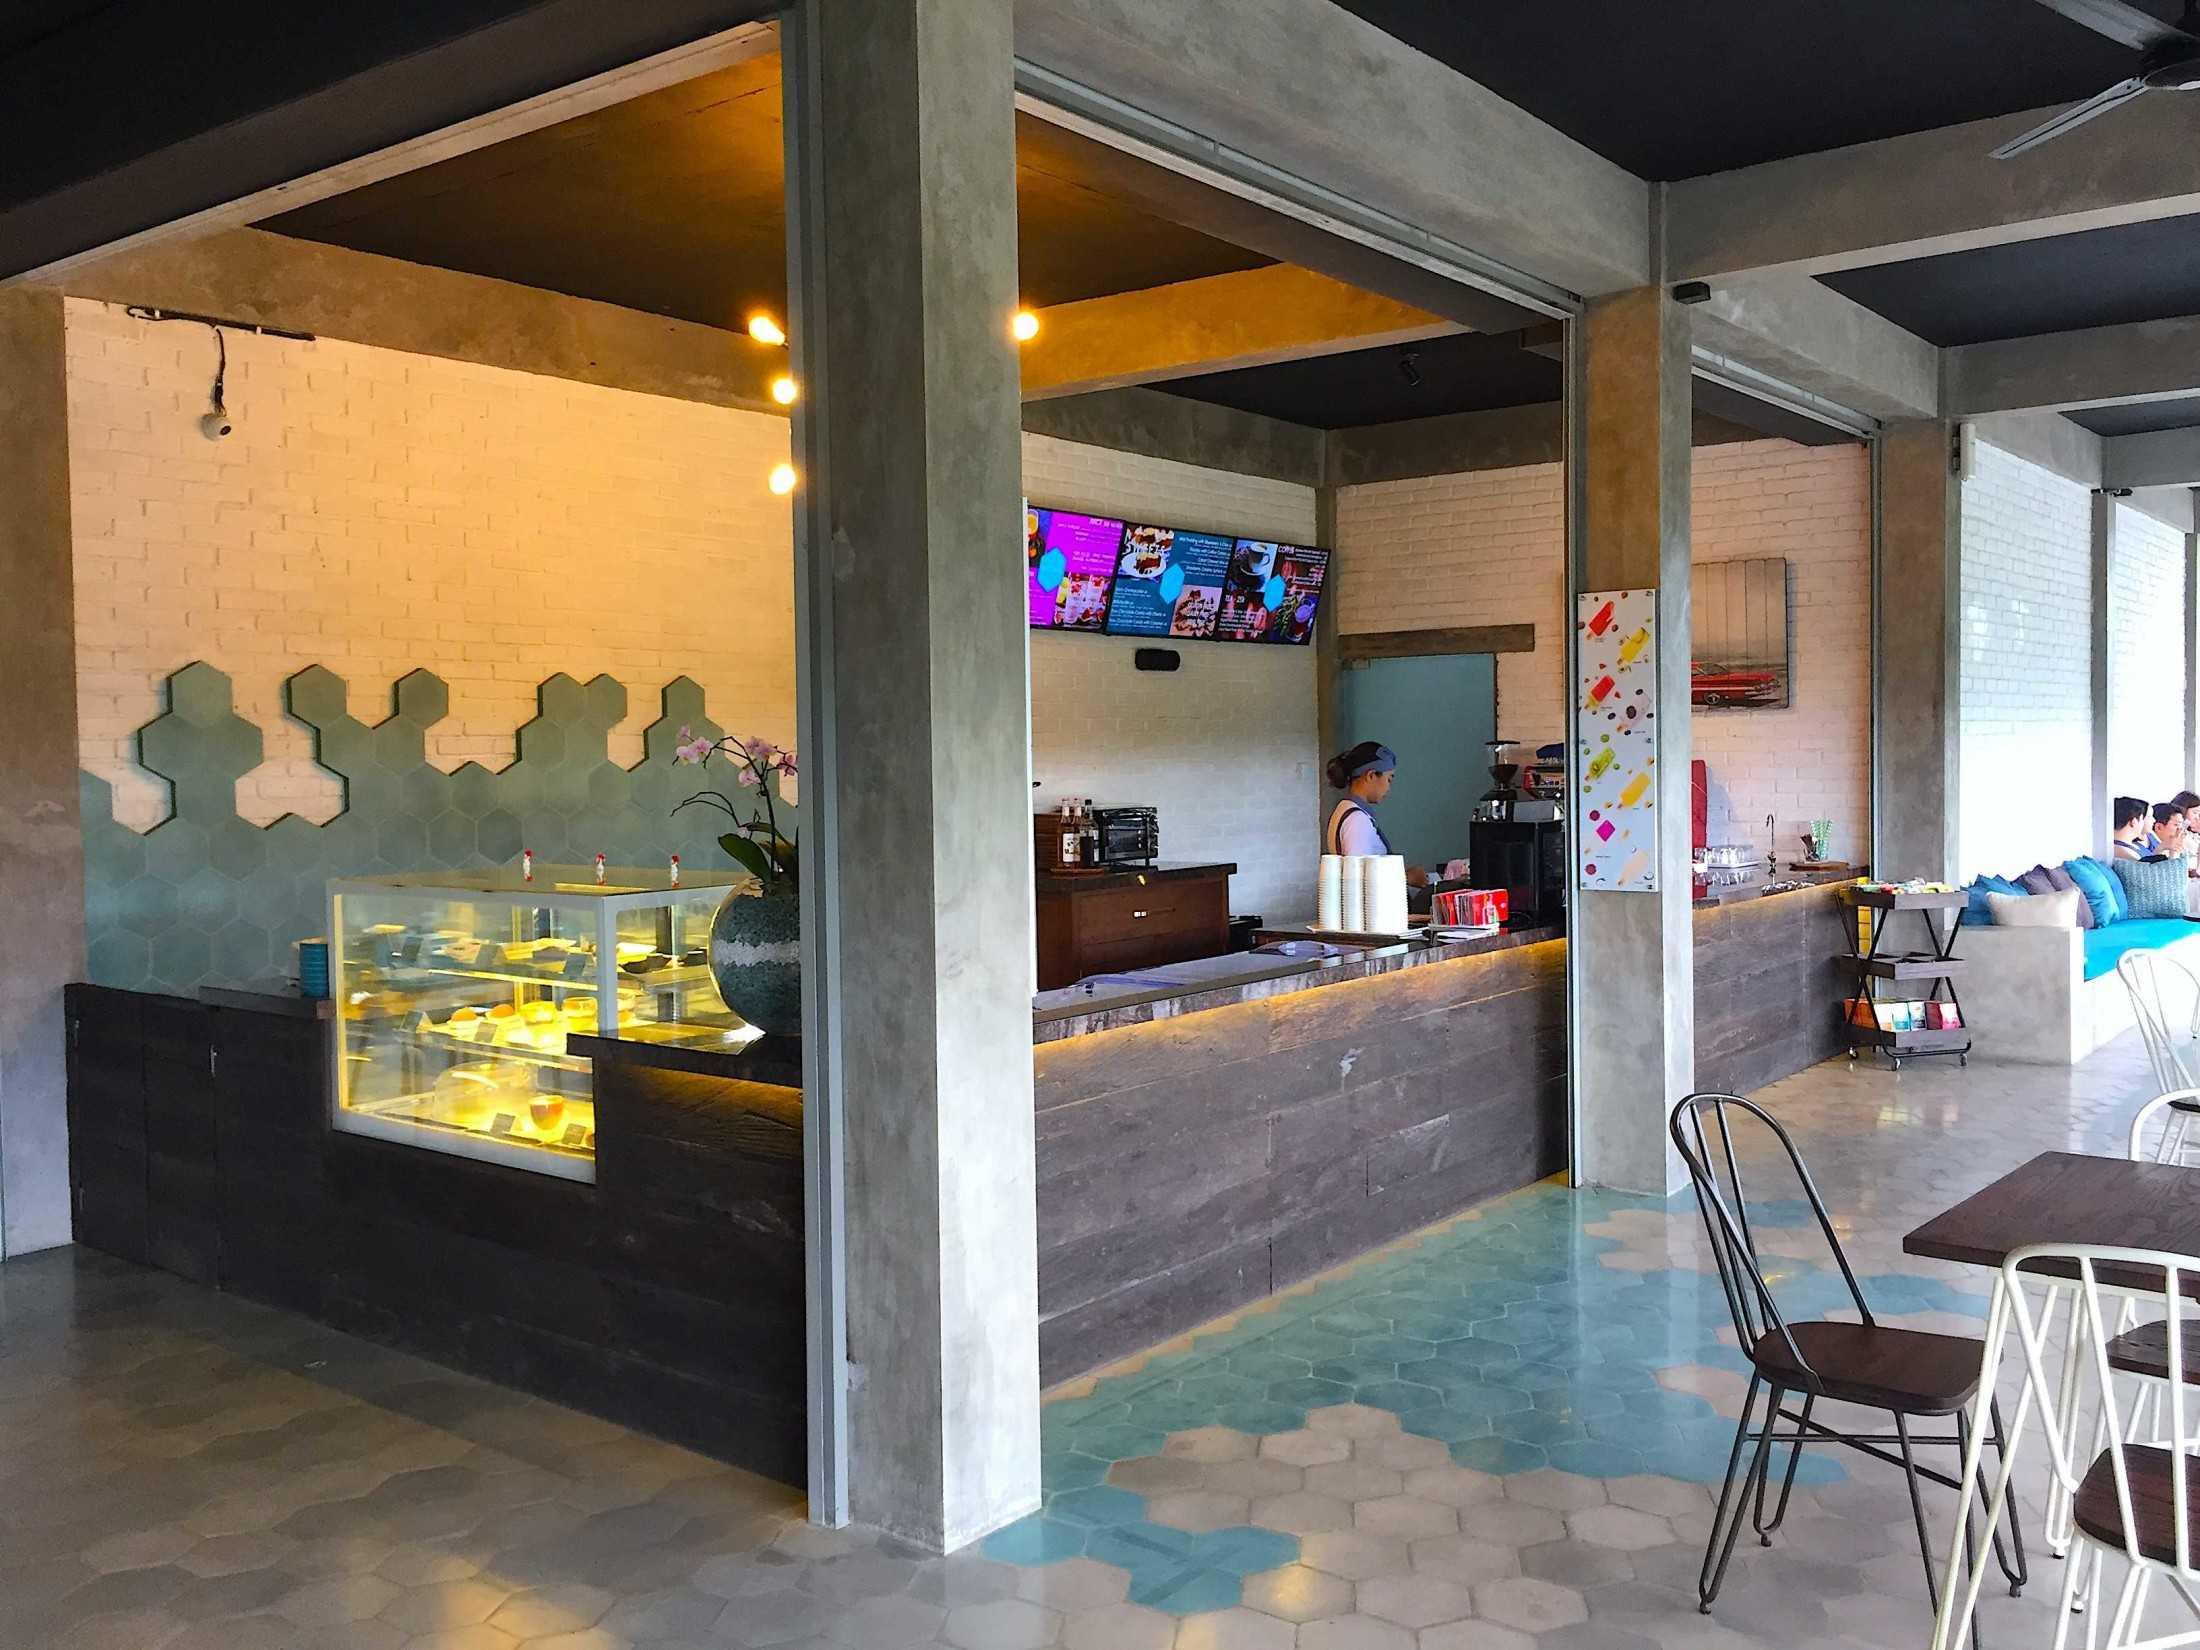 Studio Asri By-Gelato Cafe Tegallalang, Kabupaten Gianyar, Bali, Indonesia Tegallalang, Kabupaten Gianyar, Bali, Indonesia Studio-Asri-By-Gelato-Cafe  58856